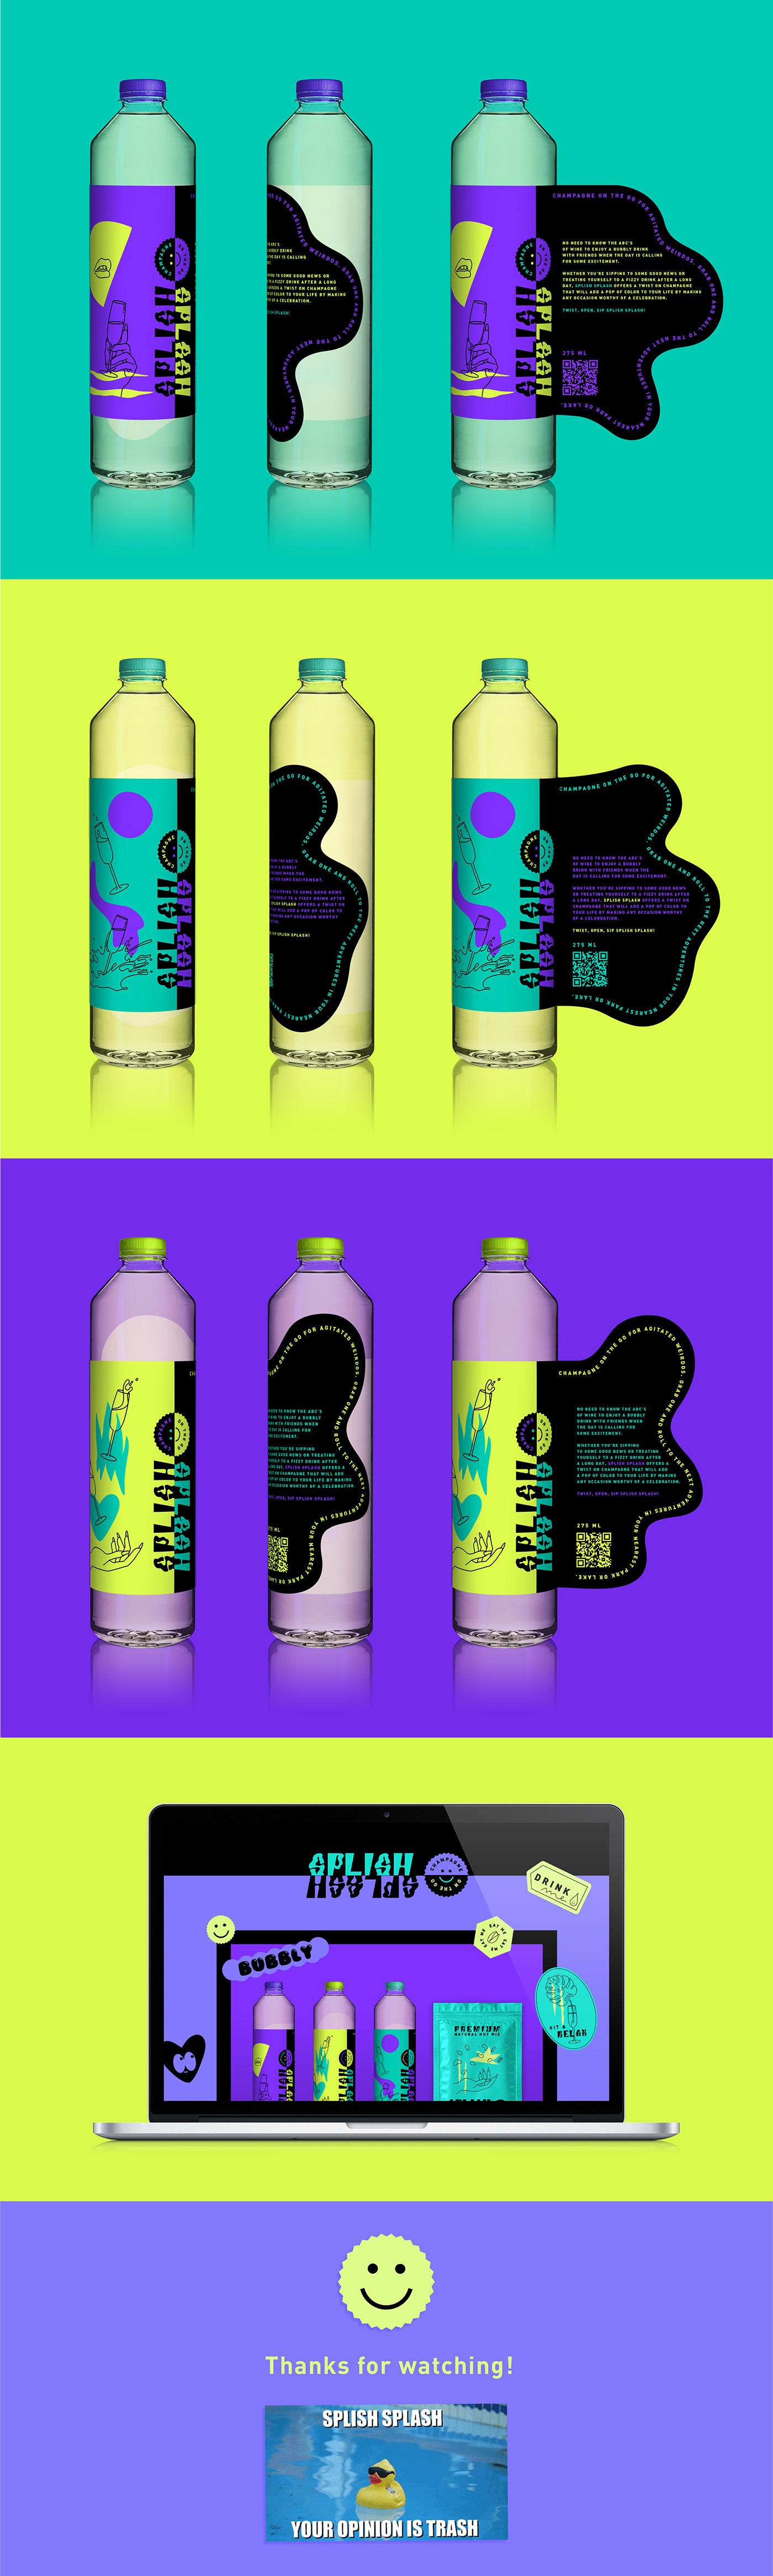 art direction  branding  Champagne graphic design  identity ILLUSTRATION  Logotype Packaging Prototyping ux/ui design